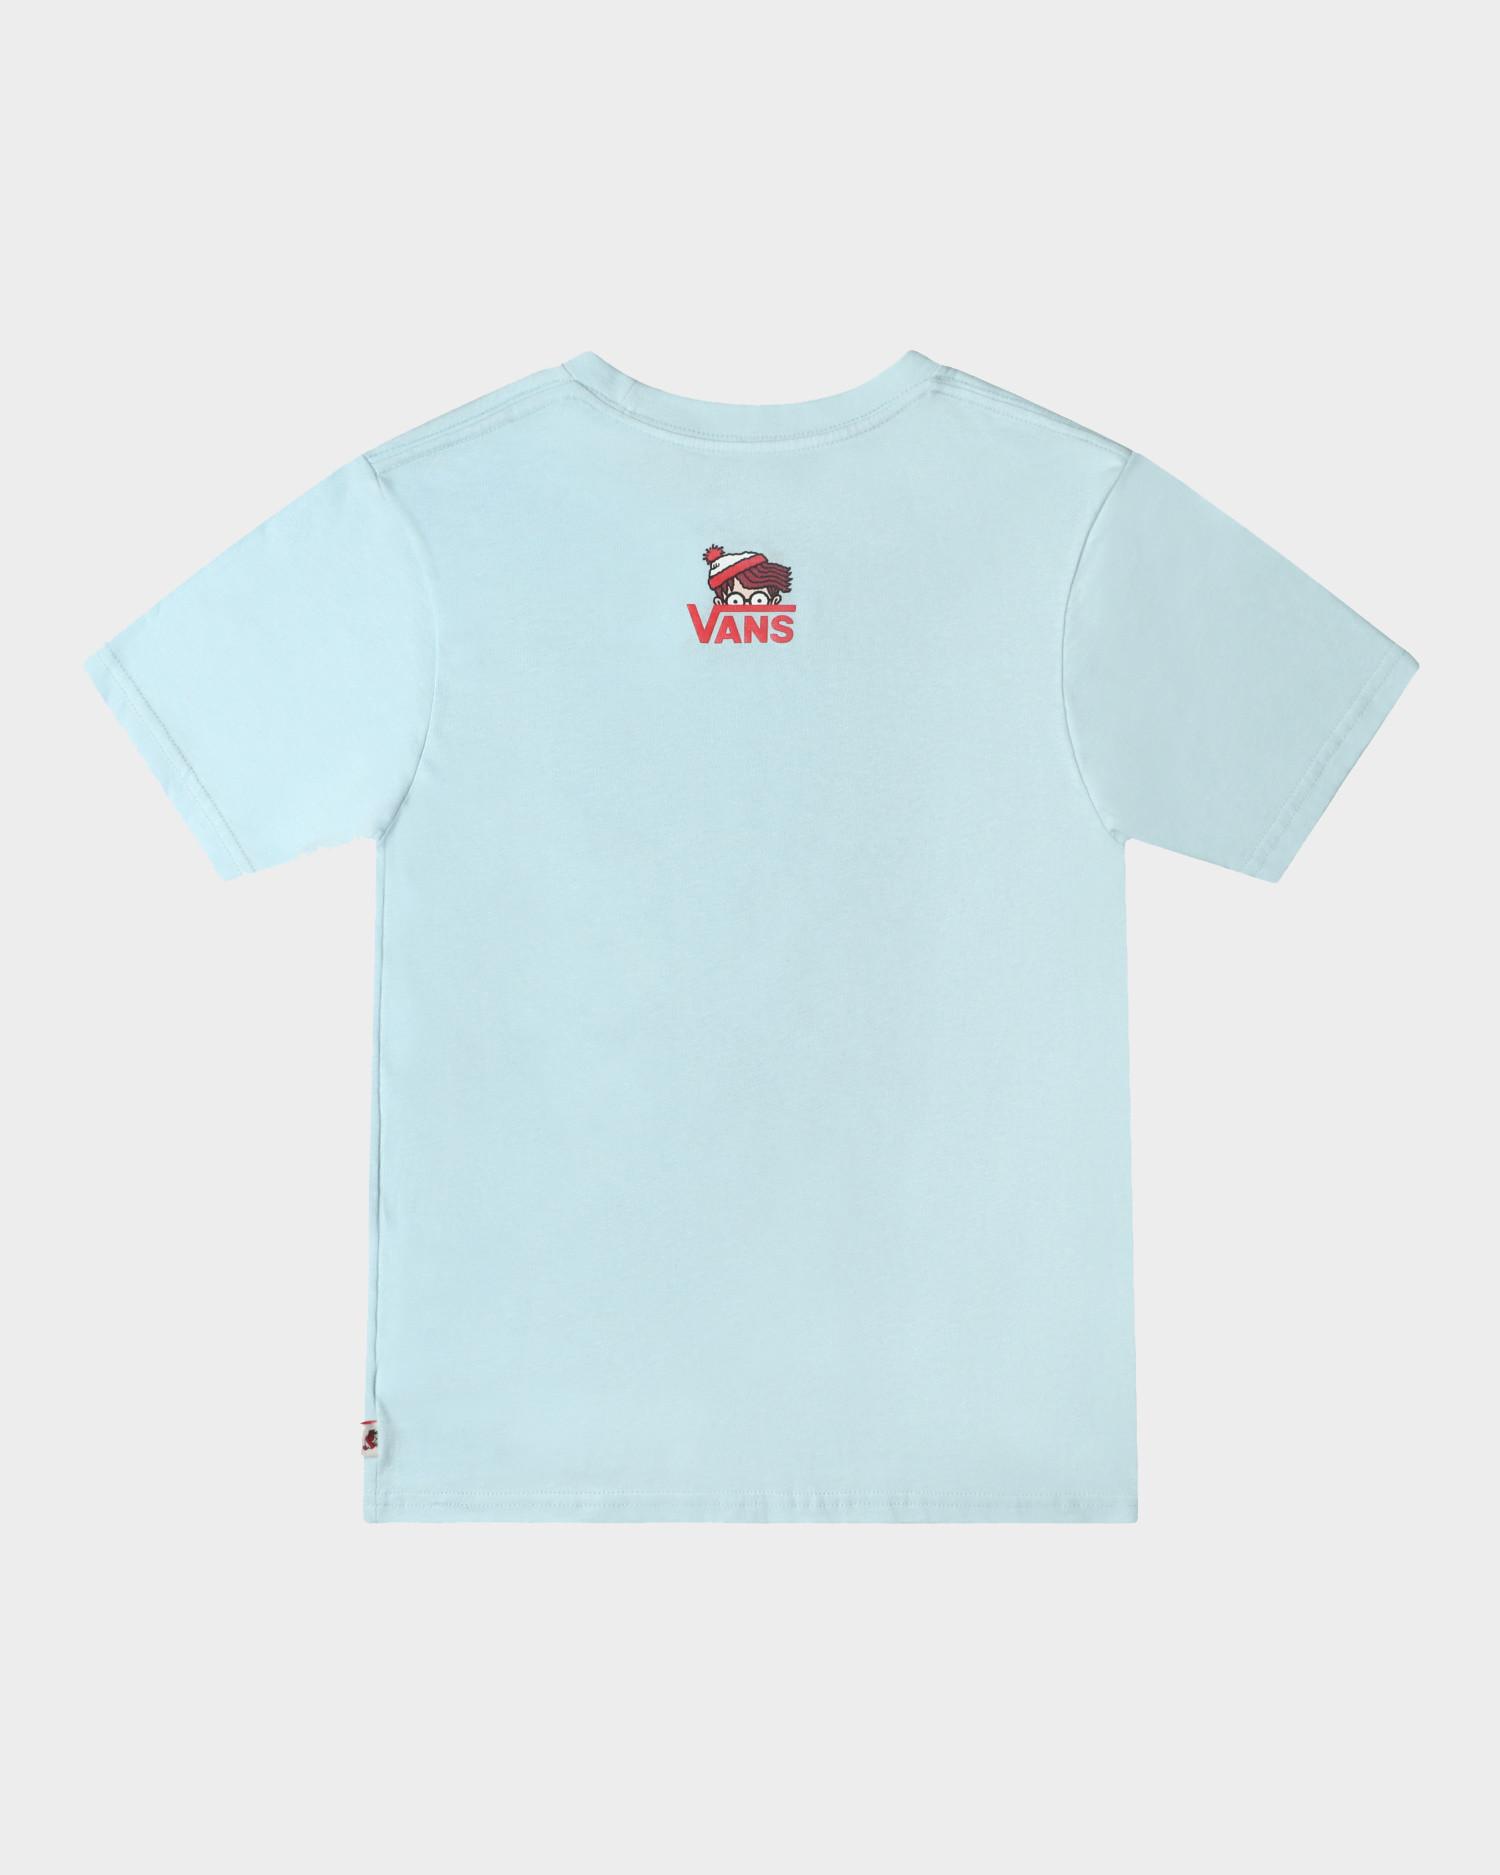 Vans X Where's Waldo T-shirt